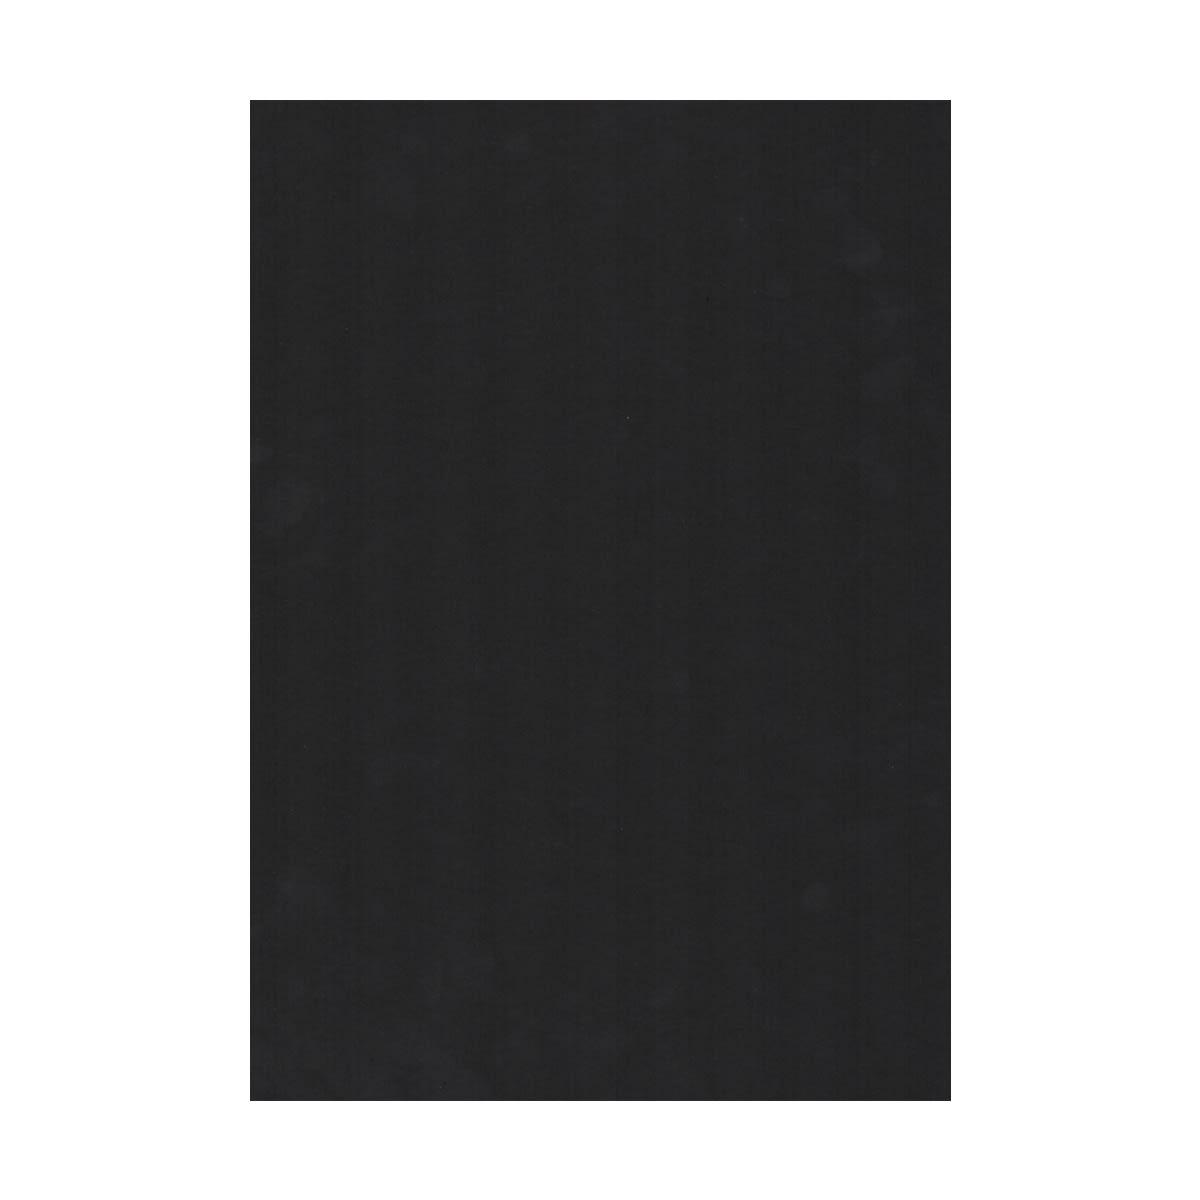 A3 OLD SCHOOL BLACK CARD 270GSM